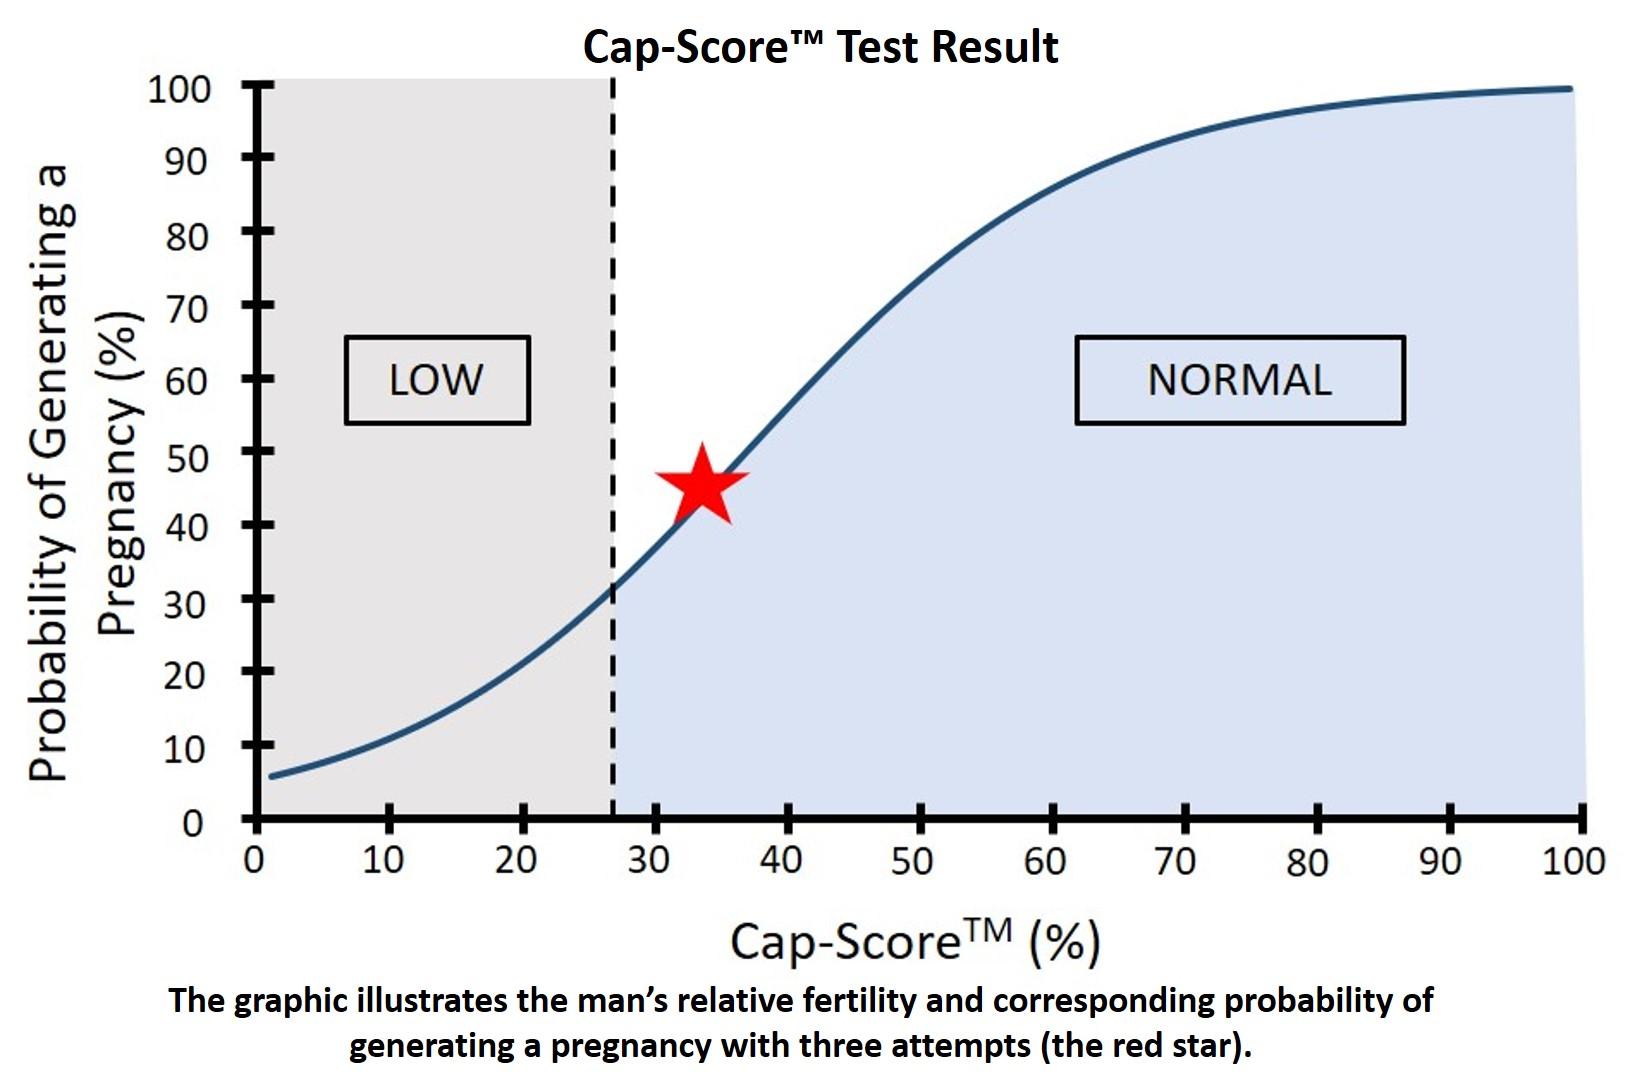 where are male infertility measured